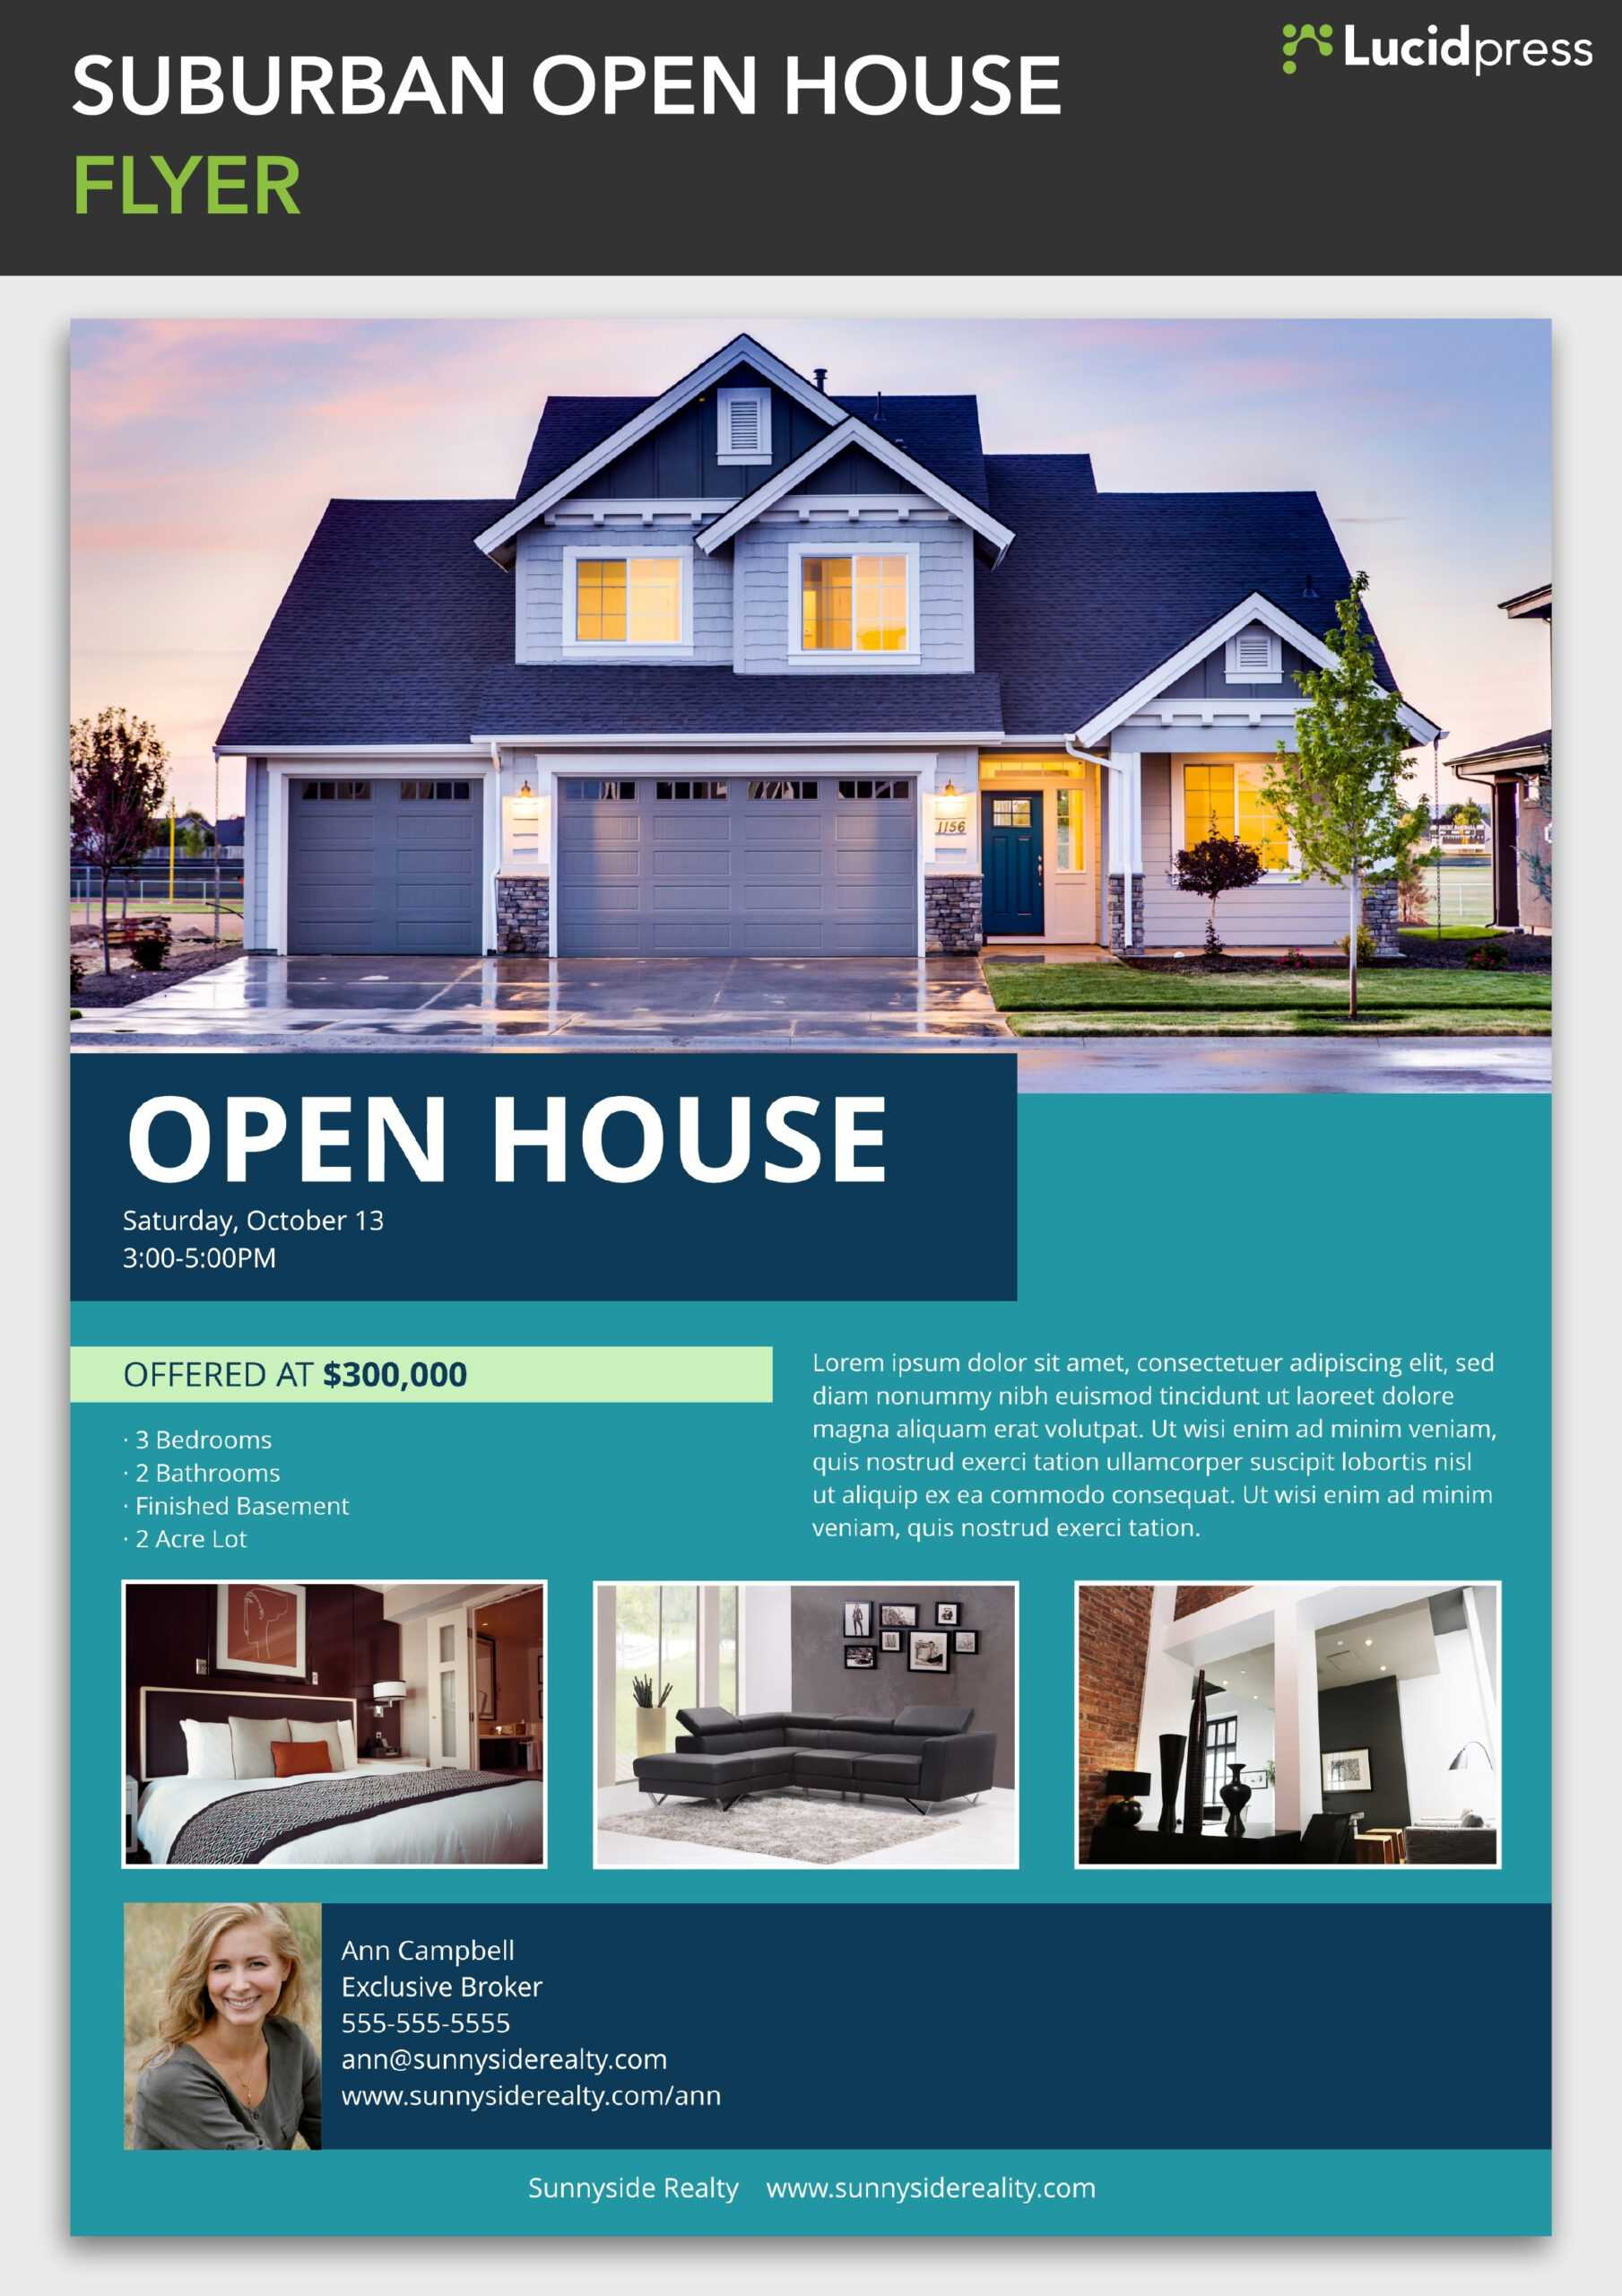 Suburban Open House Flyer Template | Lucidpress With Regard To Free Open House Flyer Template